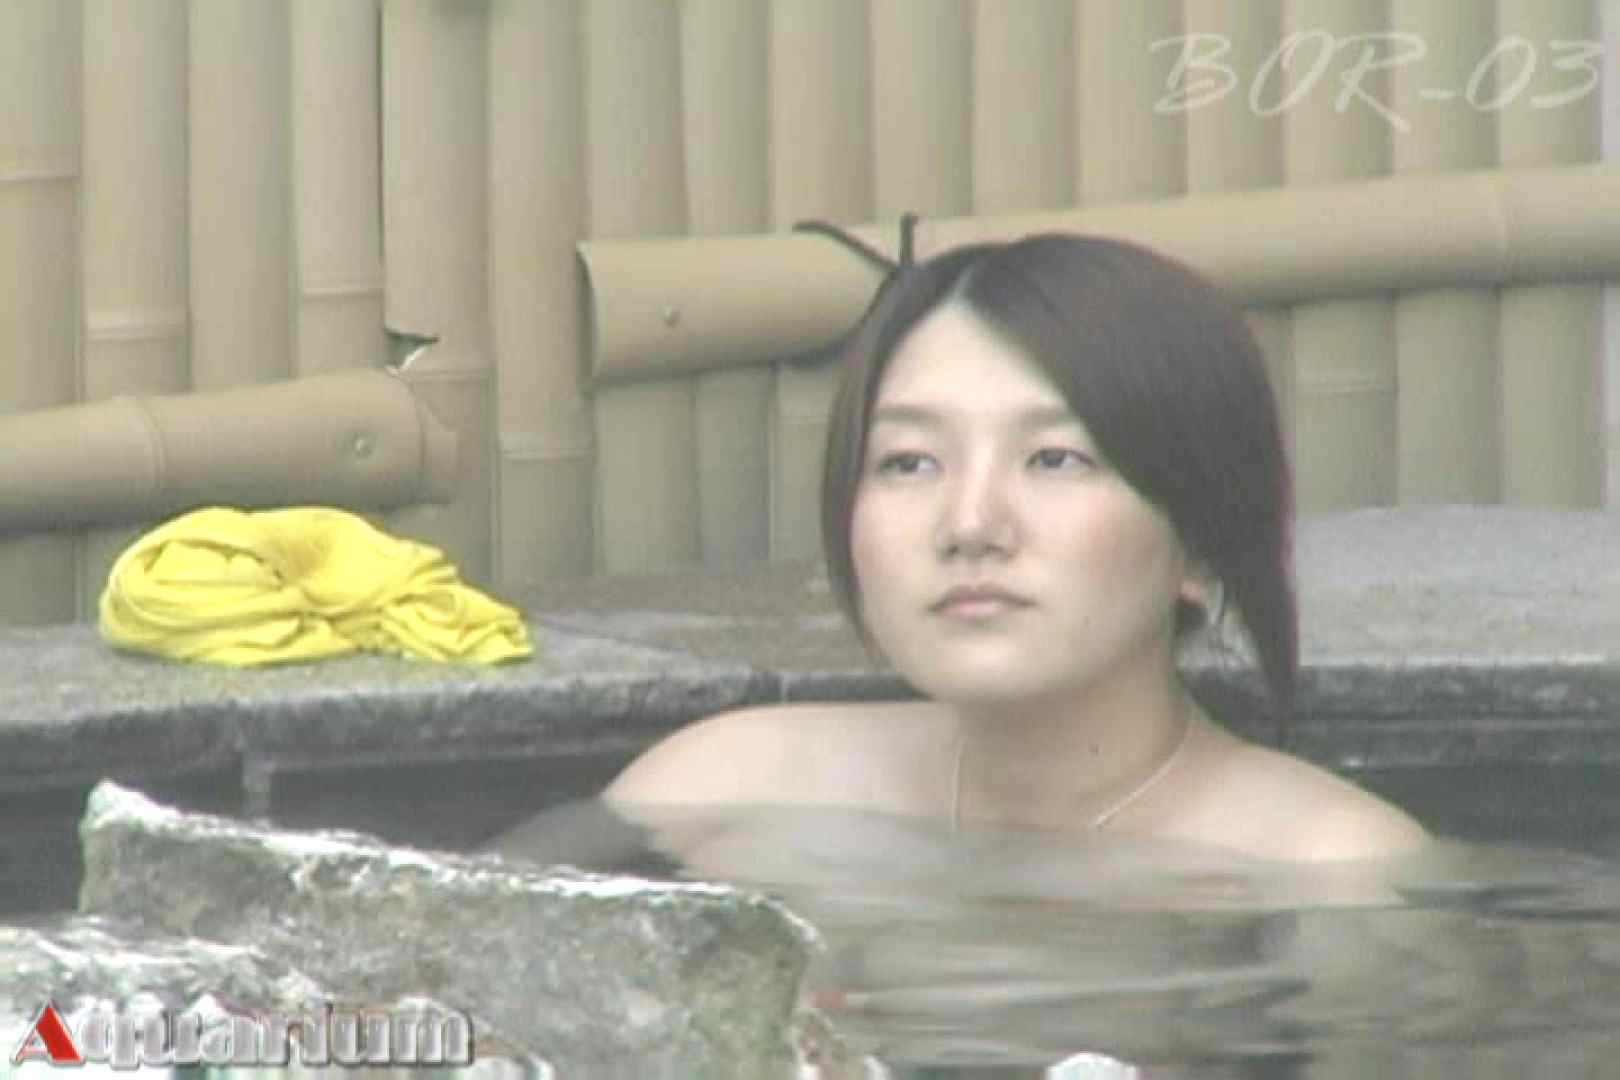 Aquaな露天風呂Vol.487 OLのエロ生活   露天風呂  95連発 46